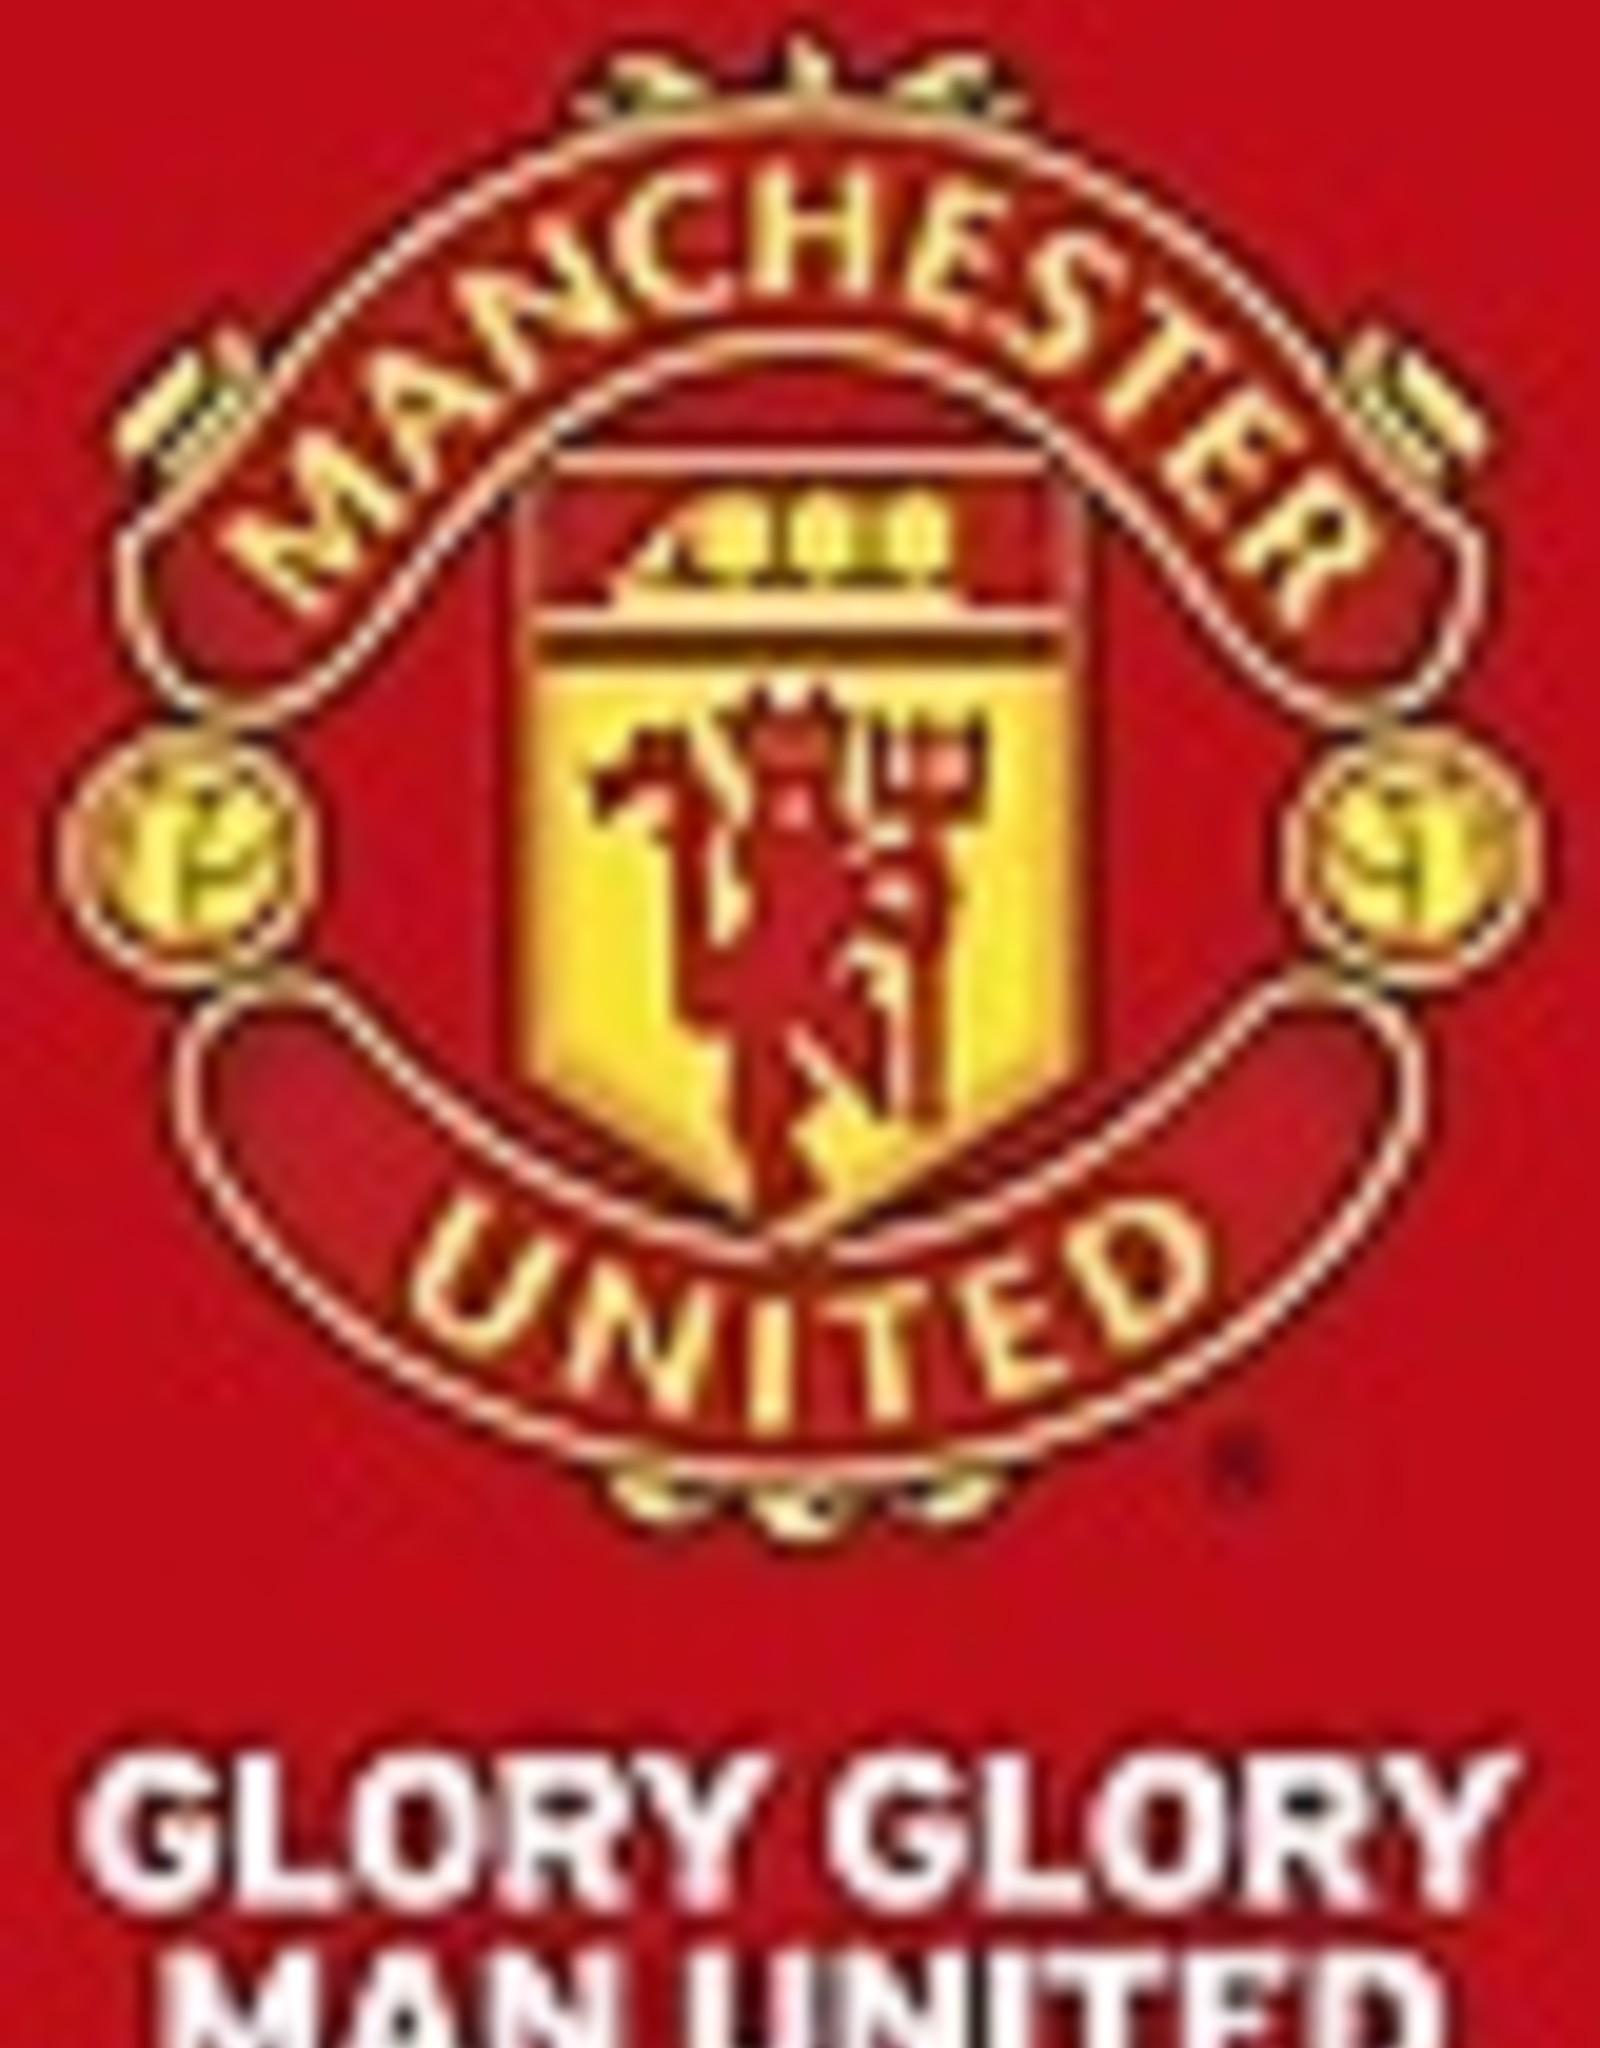 Man United Crest Poster